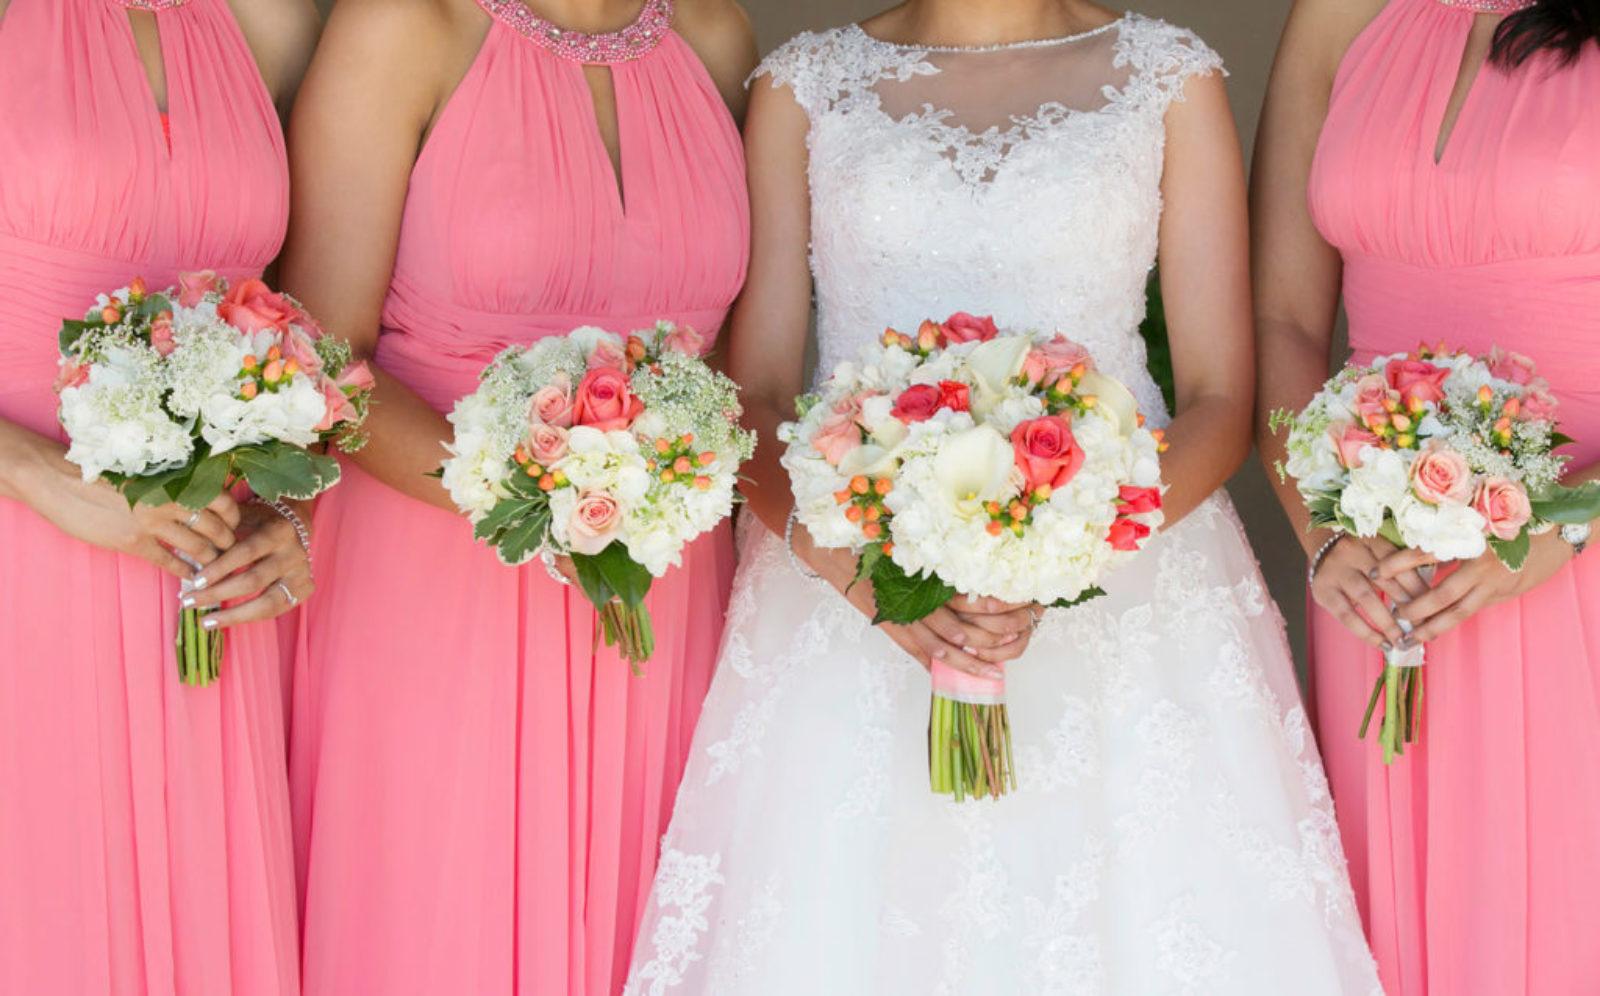 weddingphotographycoloradosprings_30-1024x638